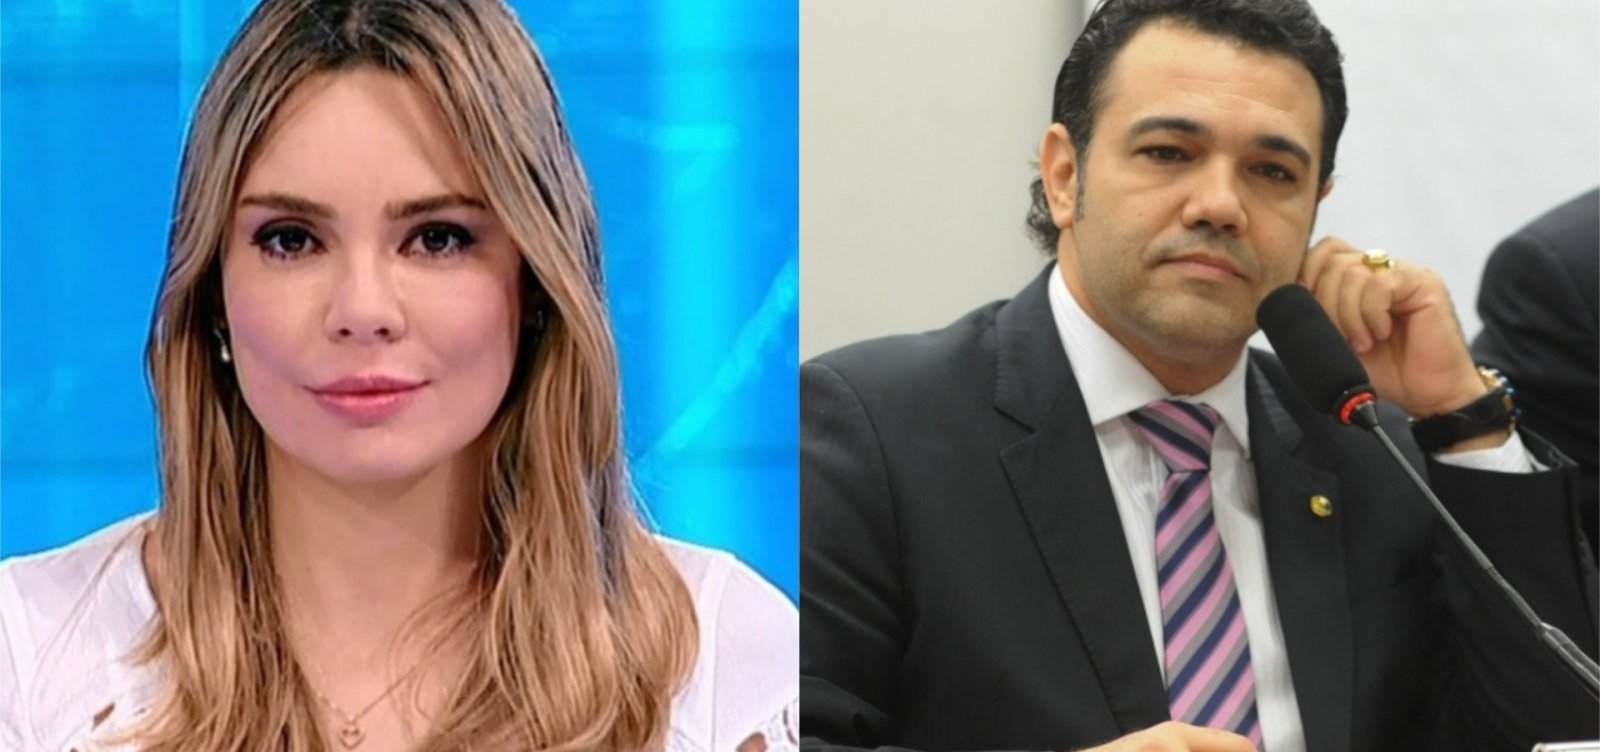 [Sheherazade diz que impeachment de Mourão é 'factoide'; Feliciano cita 'condutas desleais']